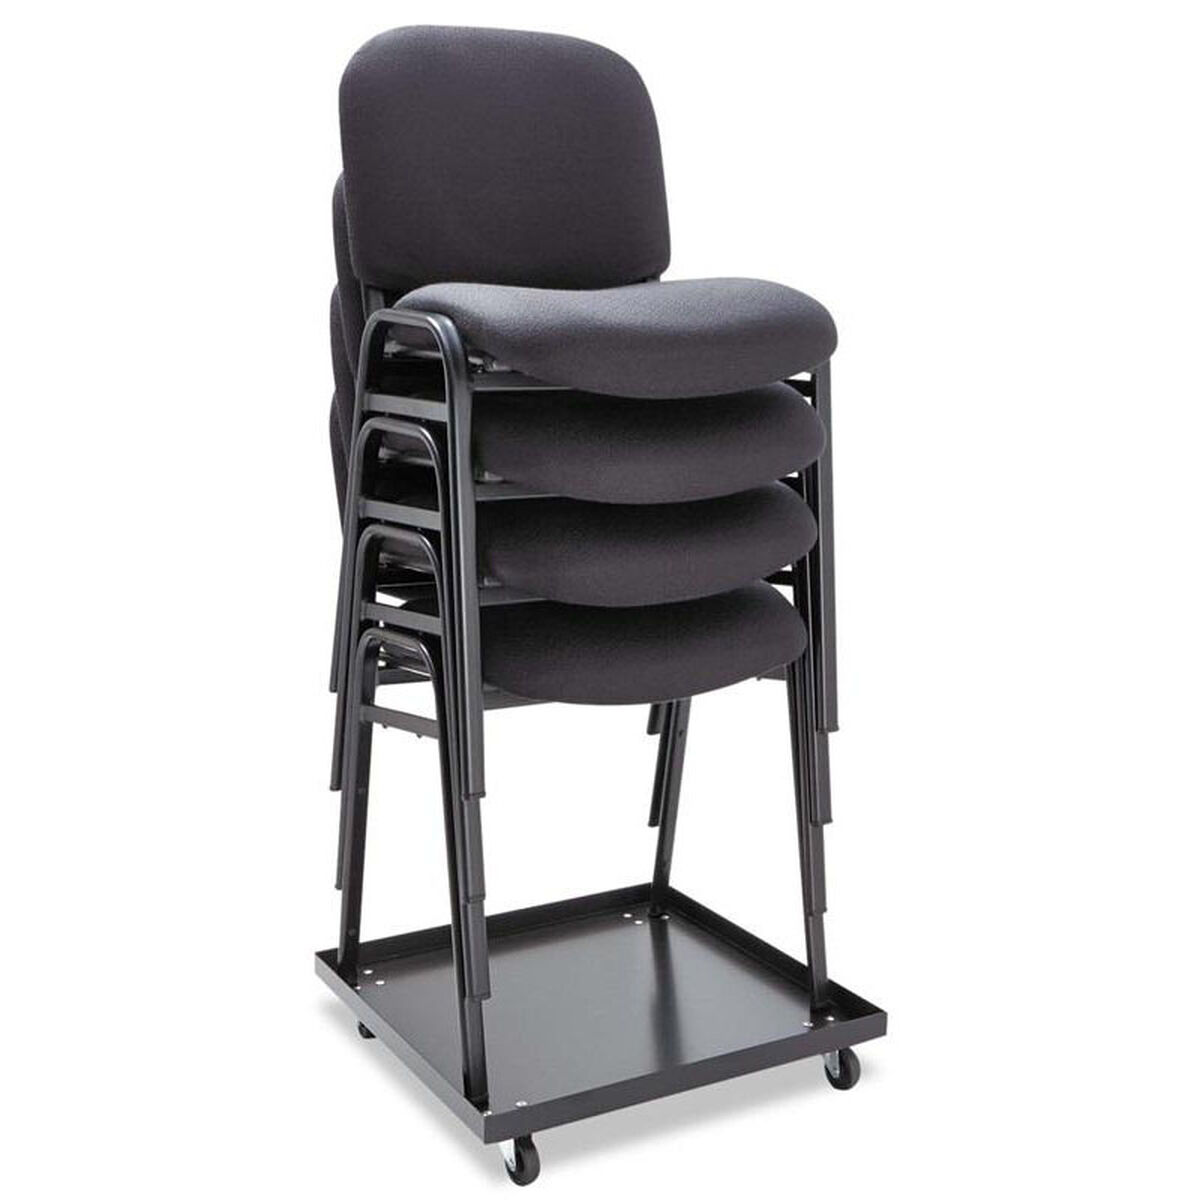 stack chair fabric black 4 box alesc67fa10b stackchairs4less com